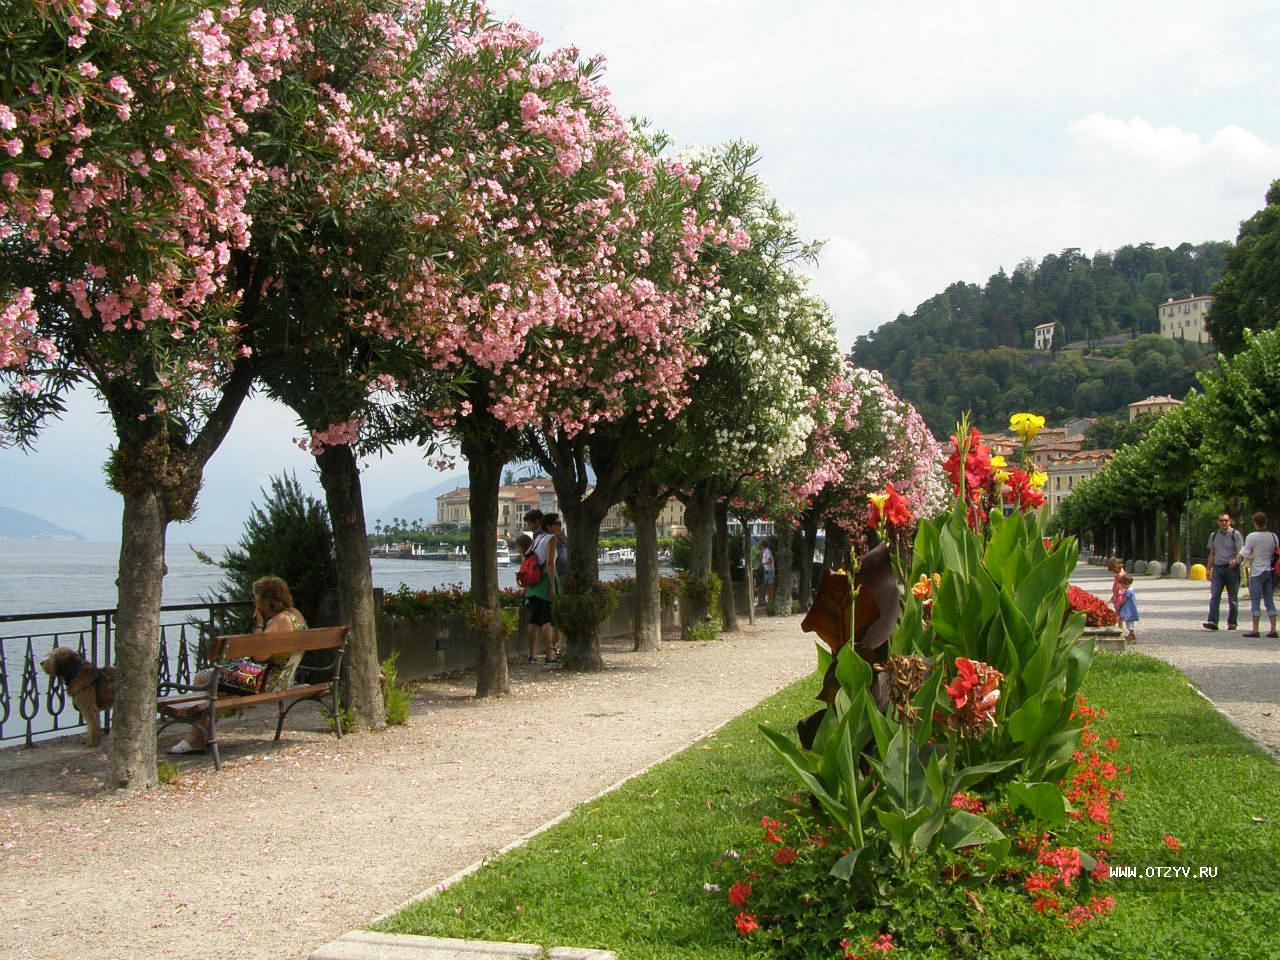 Доставка цветов по италии комо, цветов